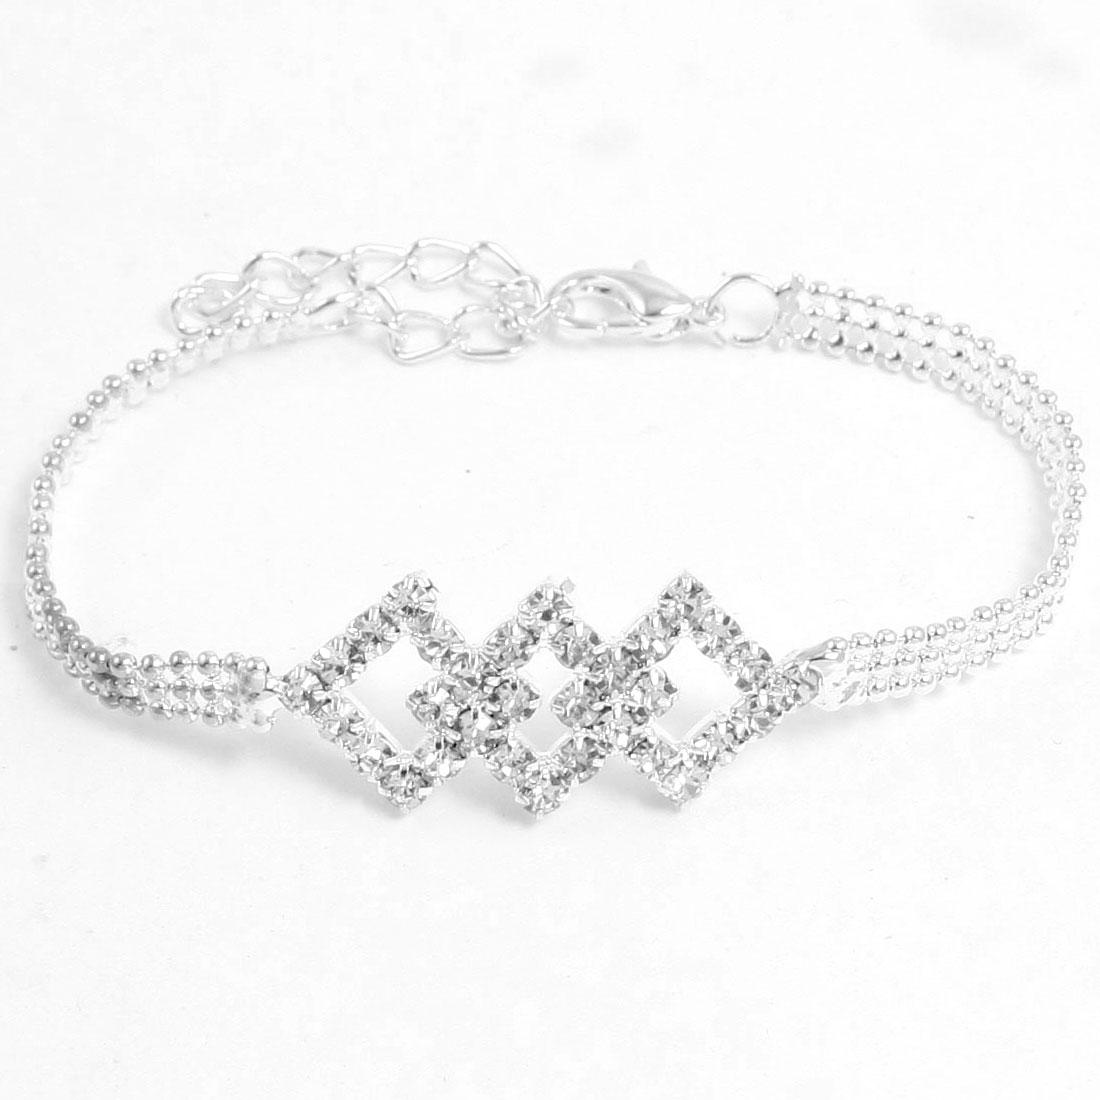 Women Wrist Decor Rhinestone Rhombus Detail Silver Tone Bead Chain Bracelet